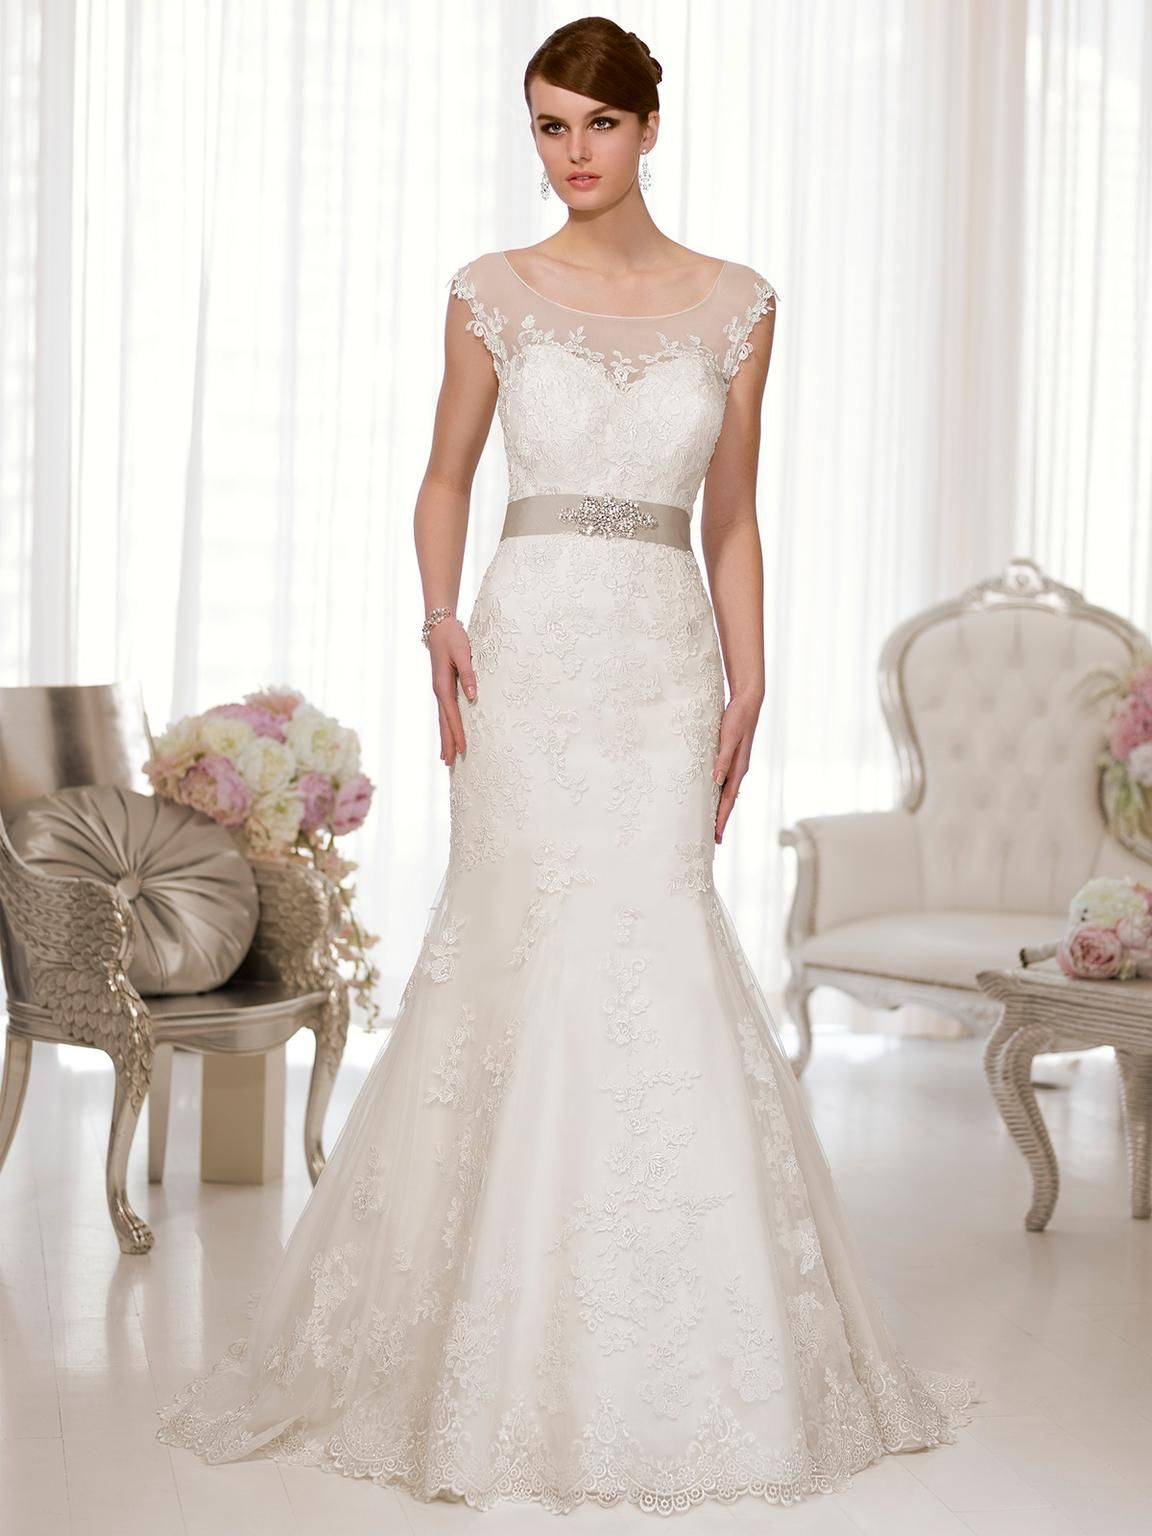 Essense of Australia D1562, 800 Size 6 Used Wedding